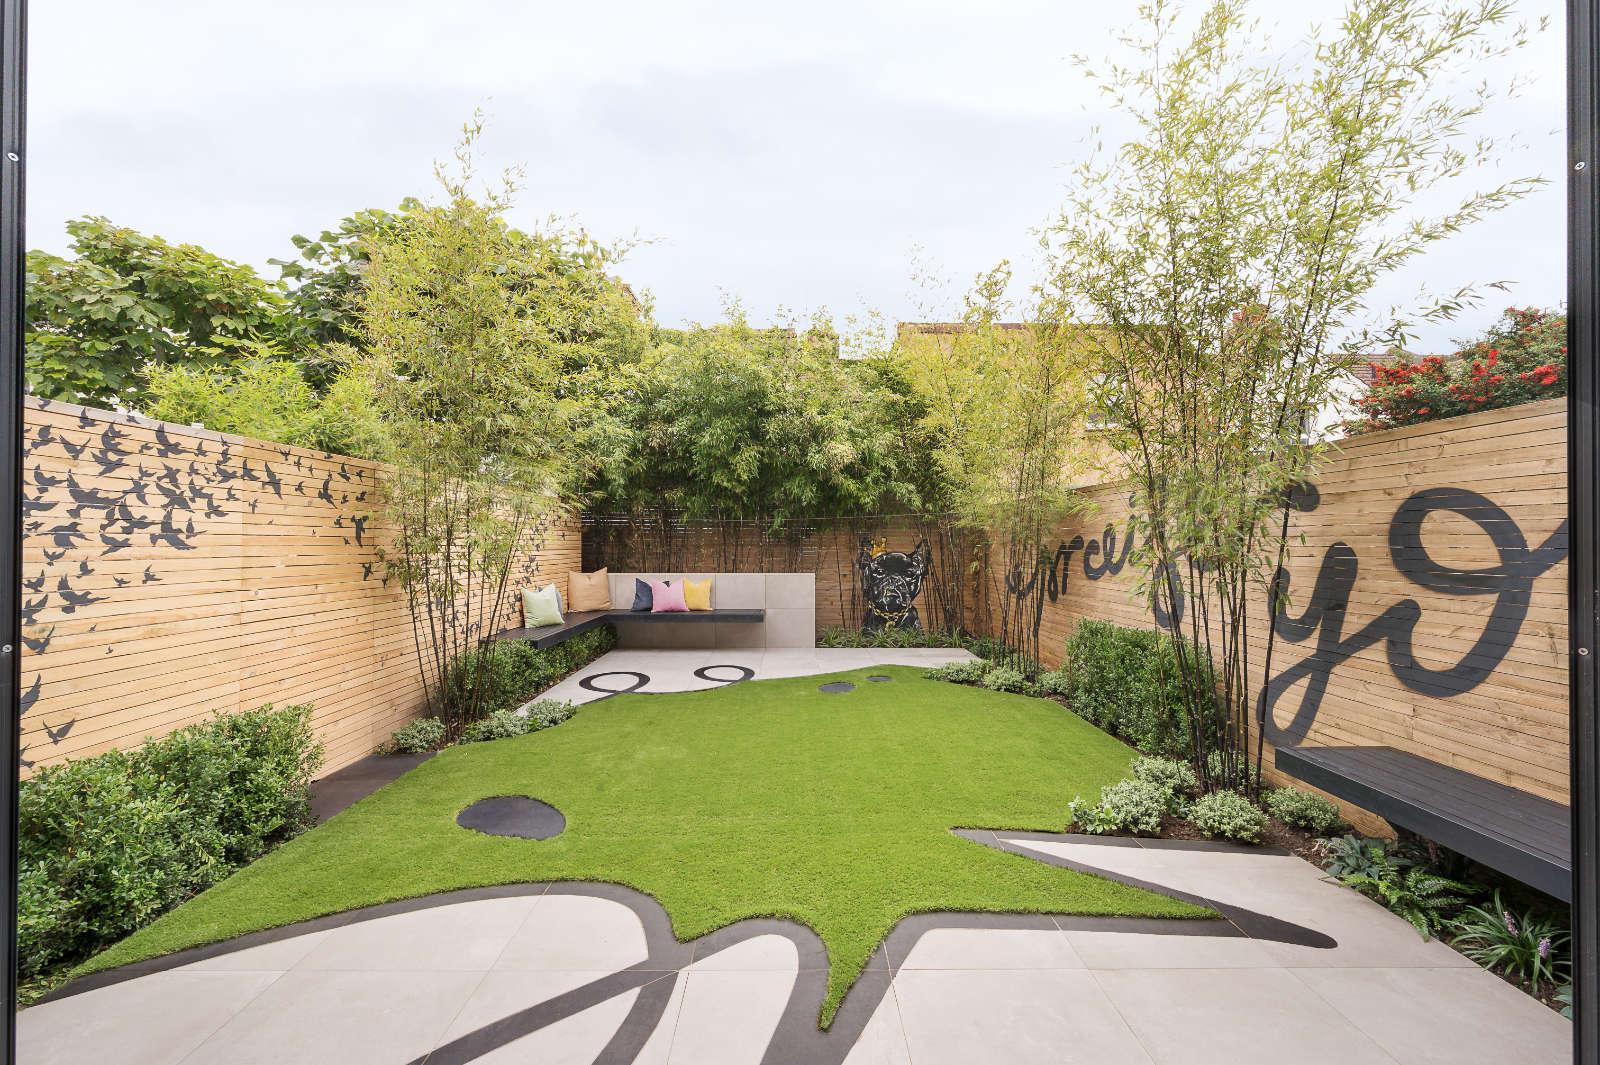 The Graffiti Garden - 1